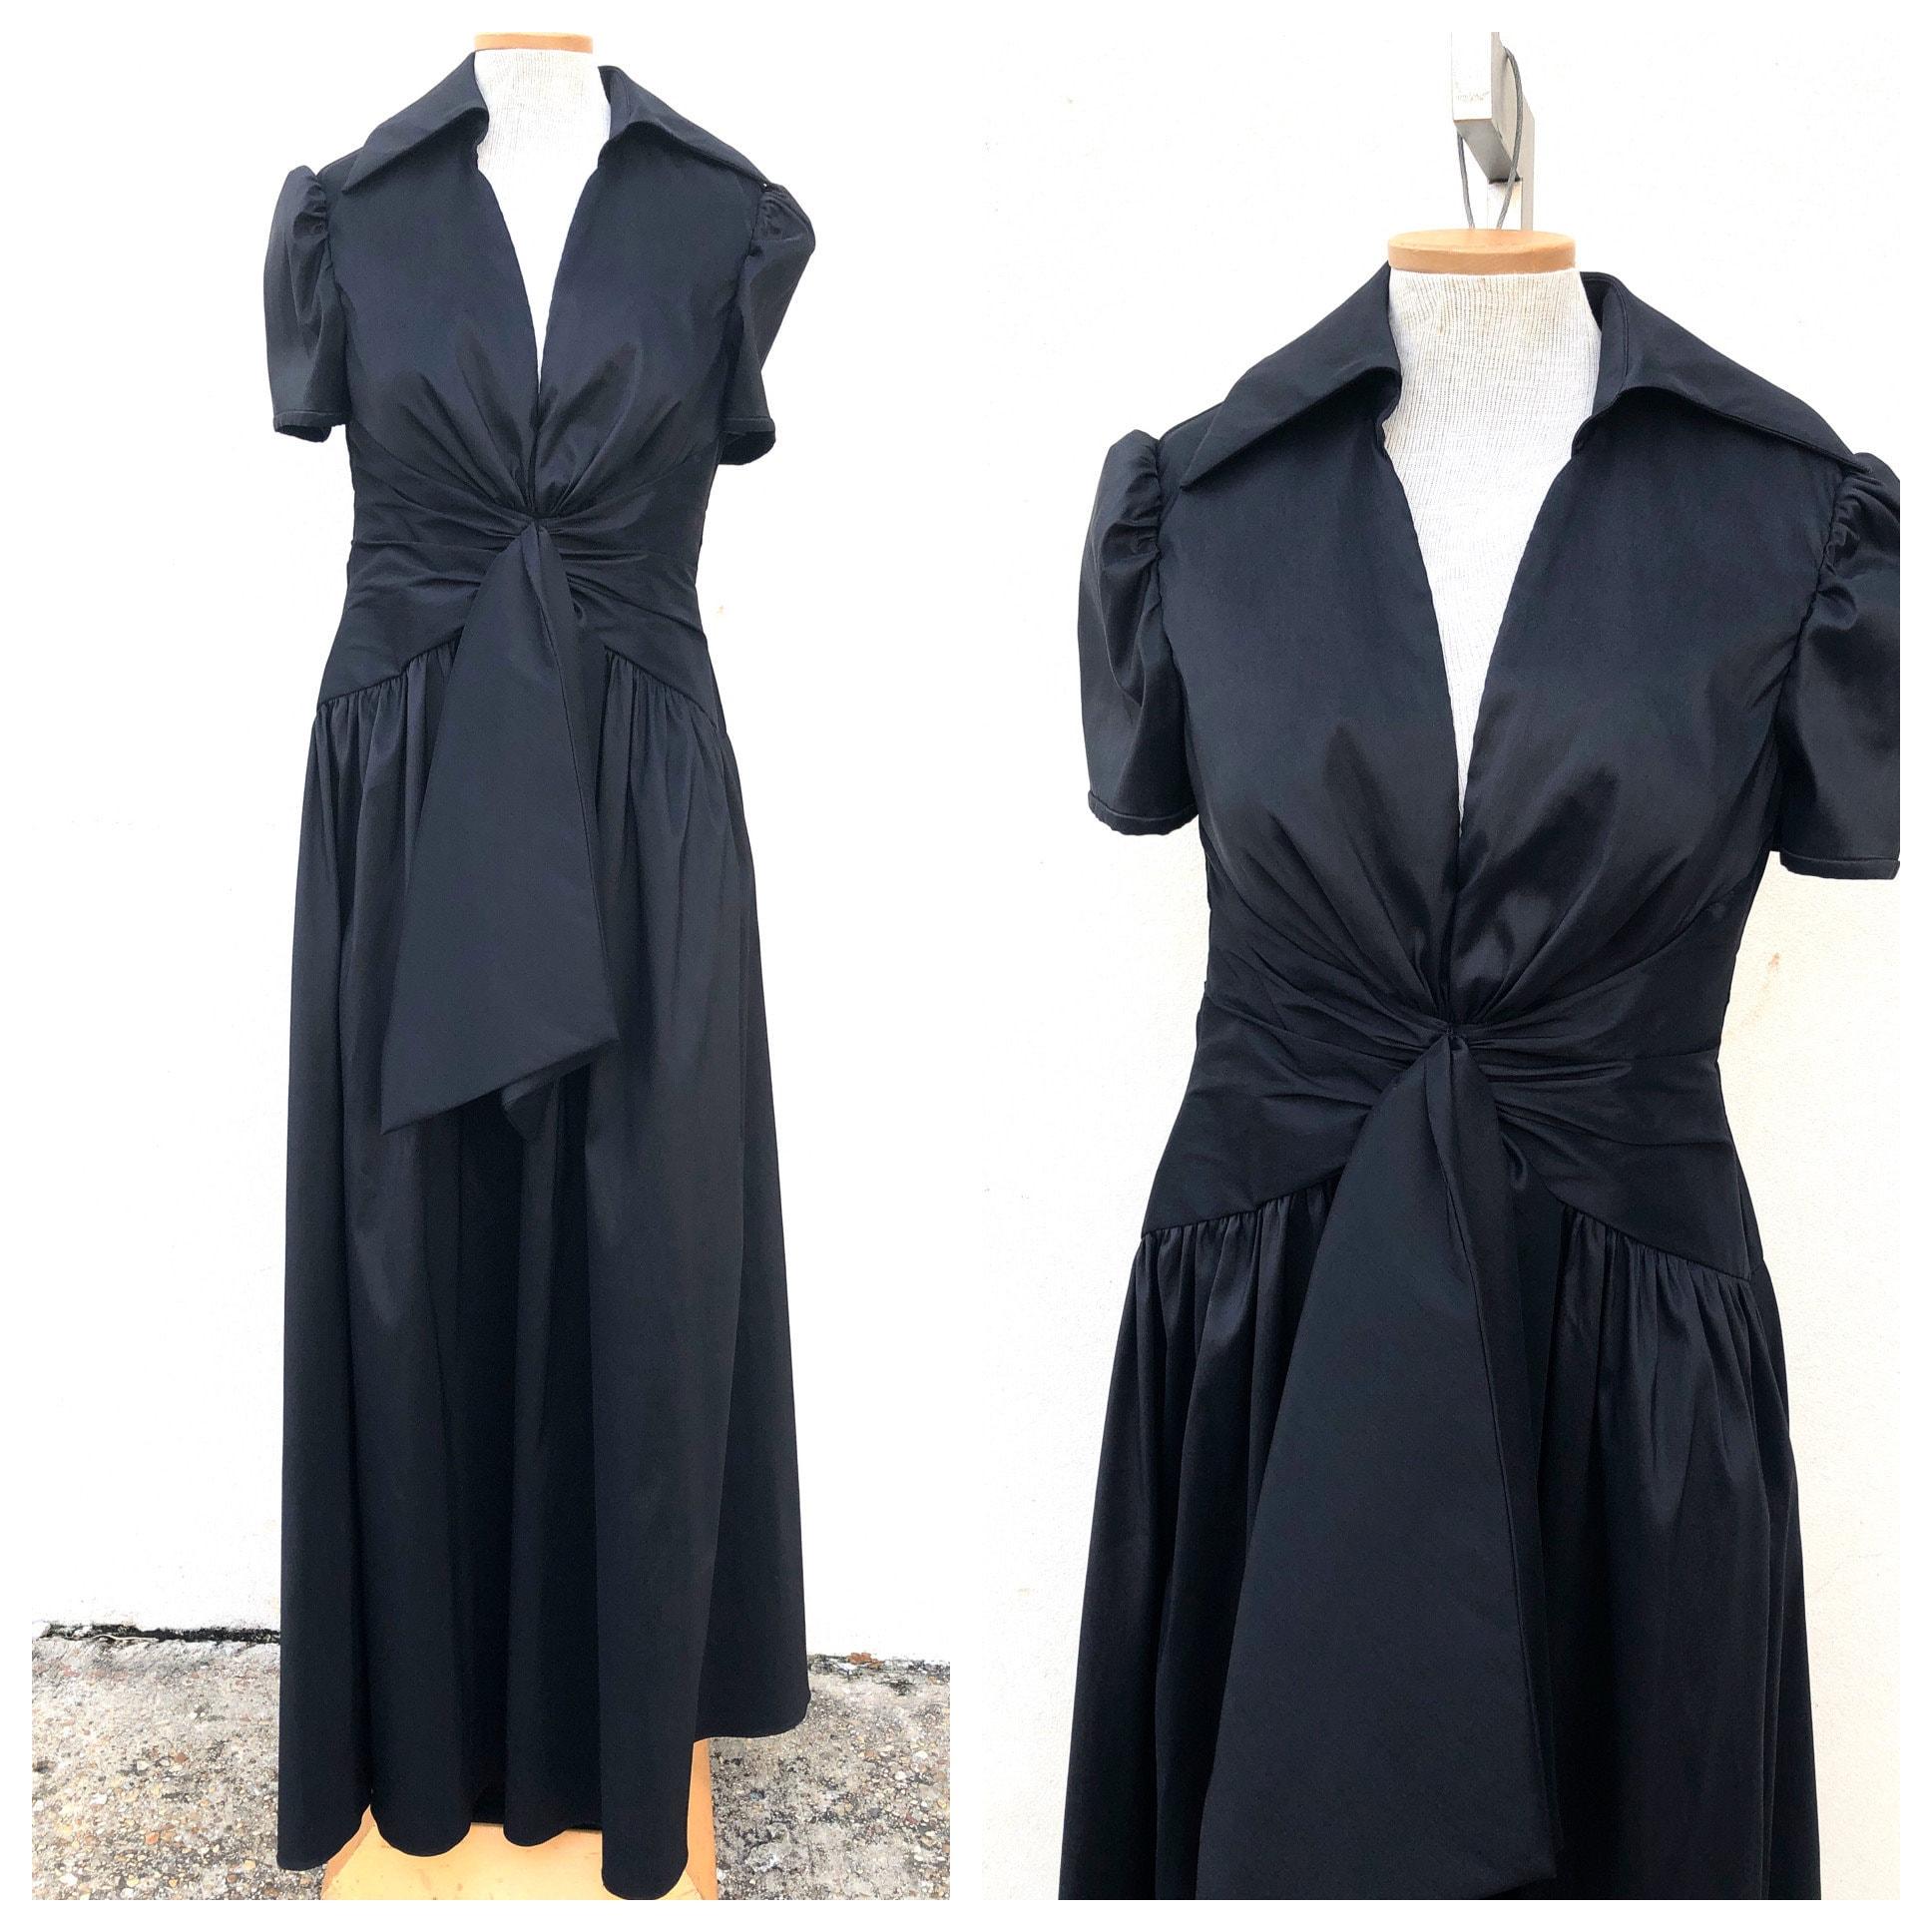 80s Dresses   Casual to Party Dresses Vintage Vtg 1980S 1990S Tony Bowls Black Ruched Evening Gown Dress $0.00 AT vintagedancer.com